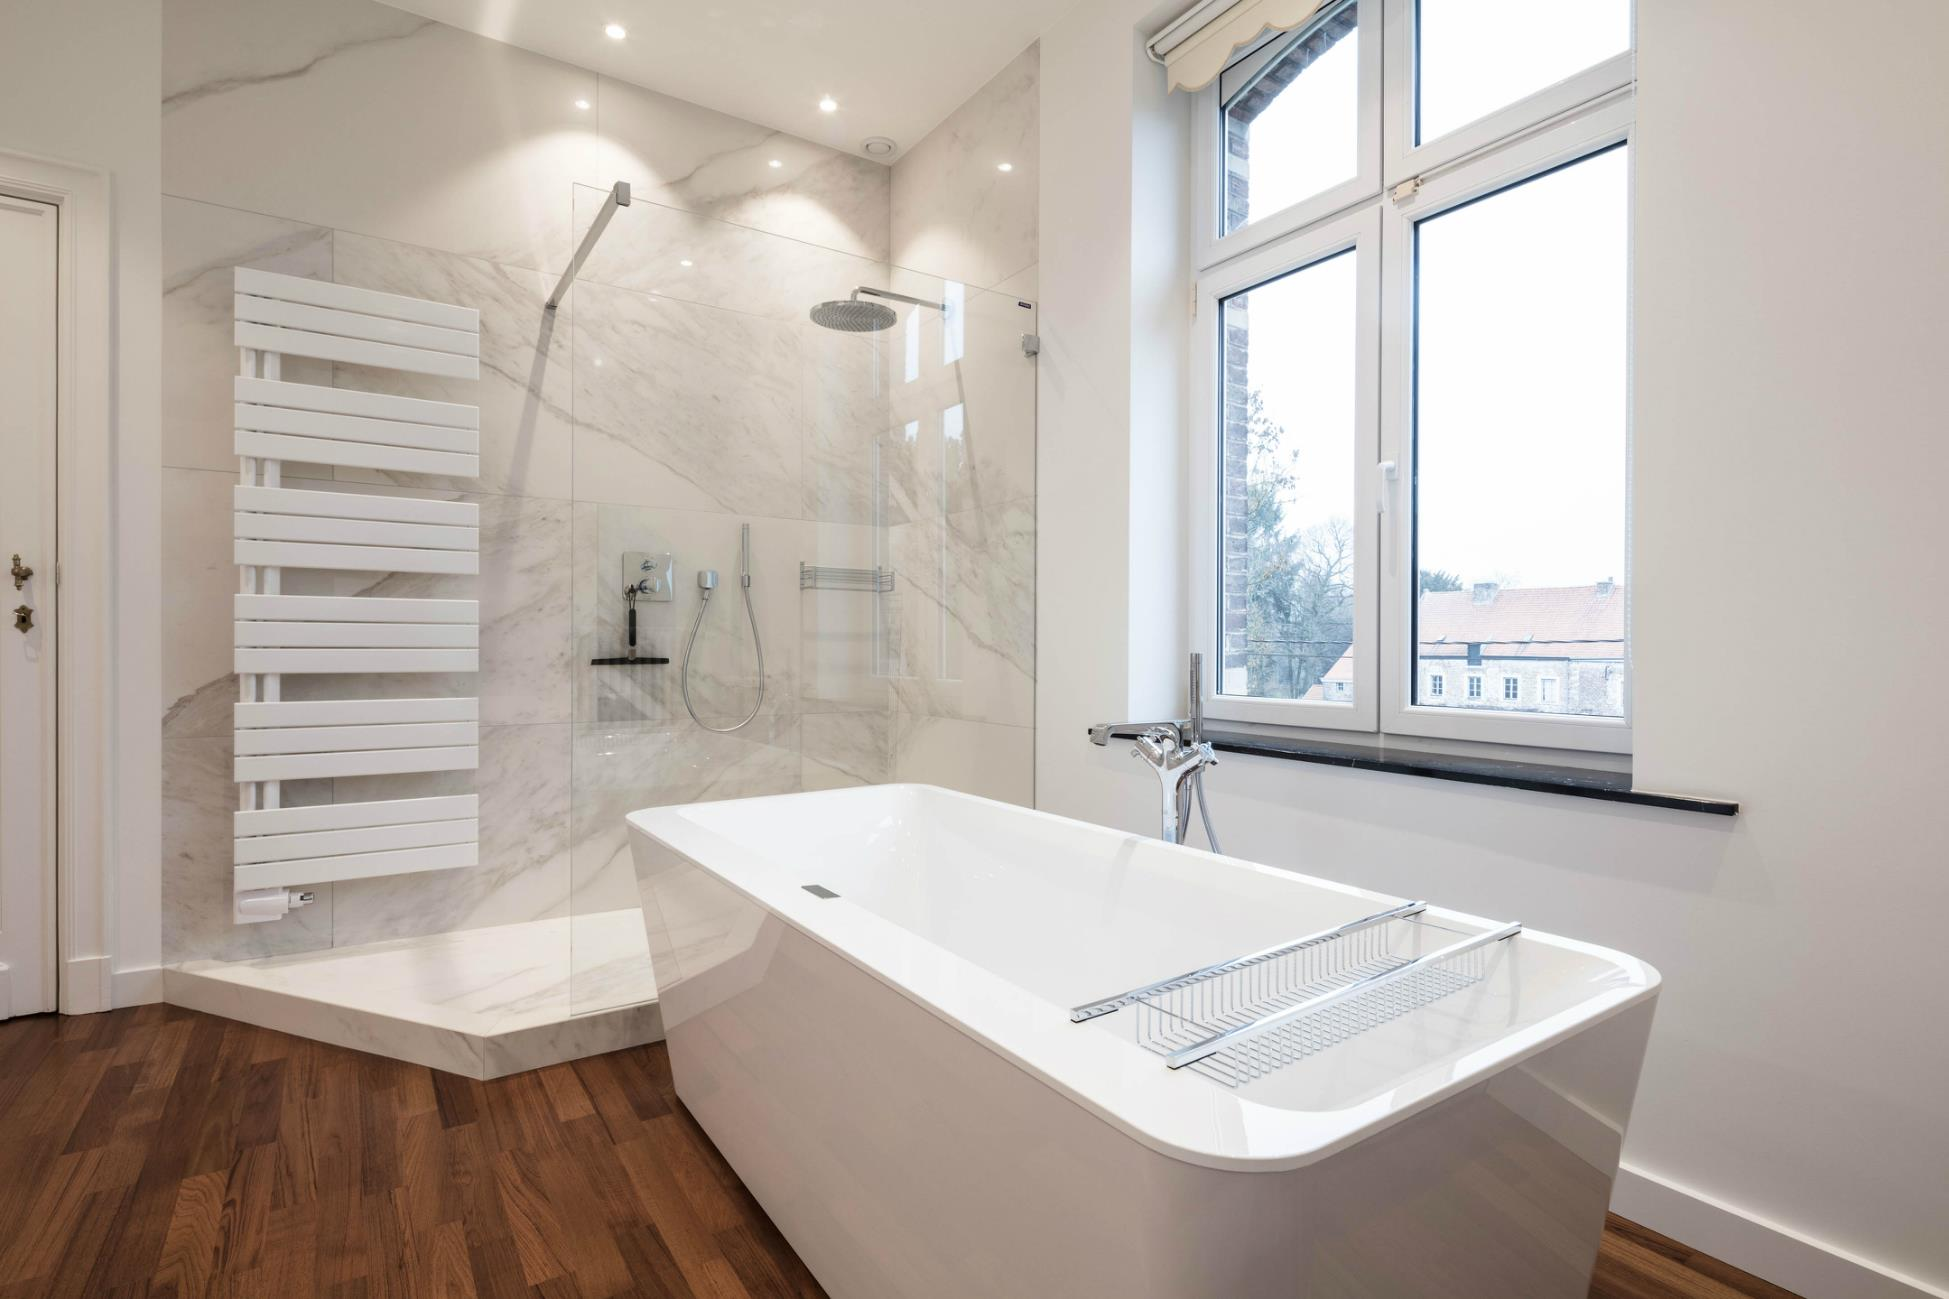 Emejing salle de bain avec parquet contemporary for Parquet salle bain